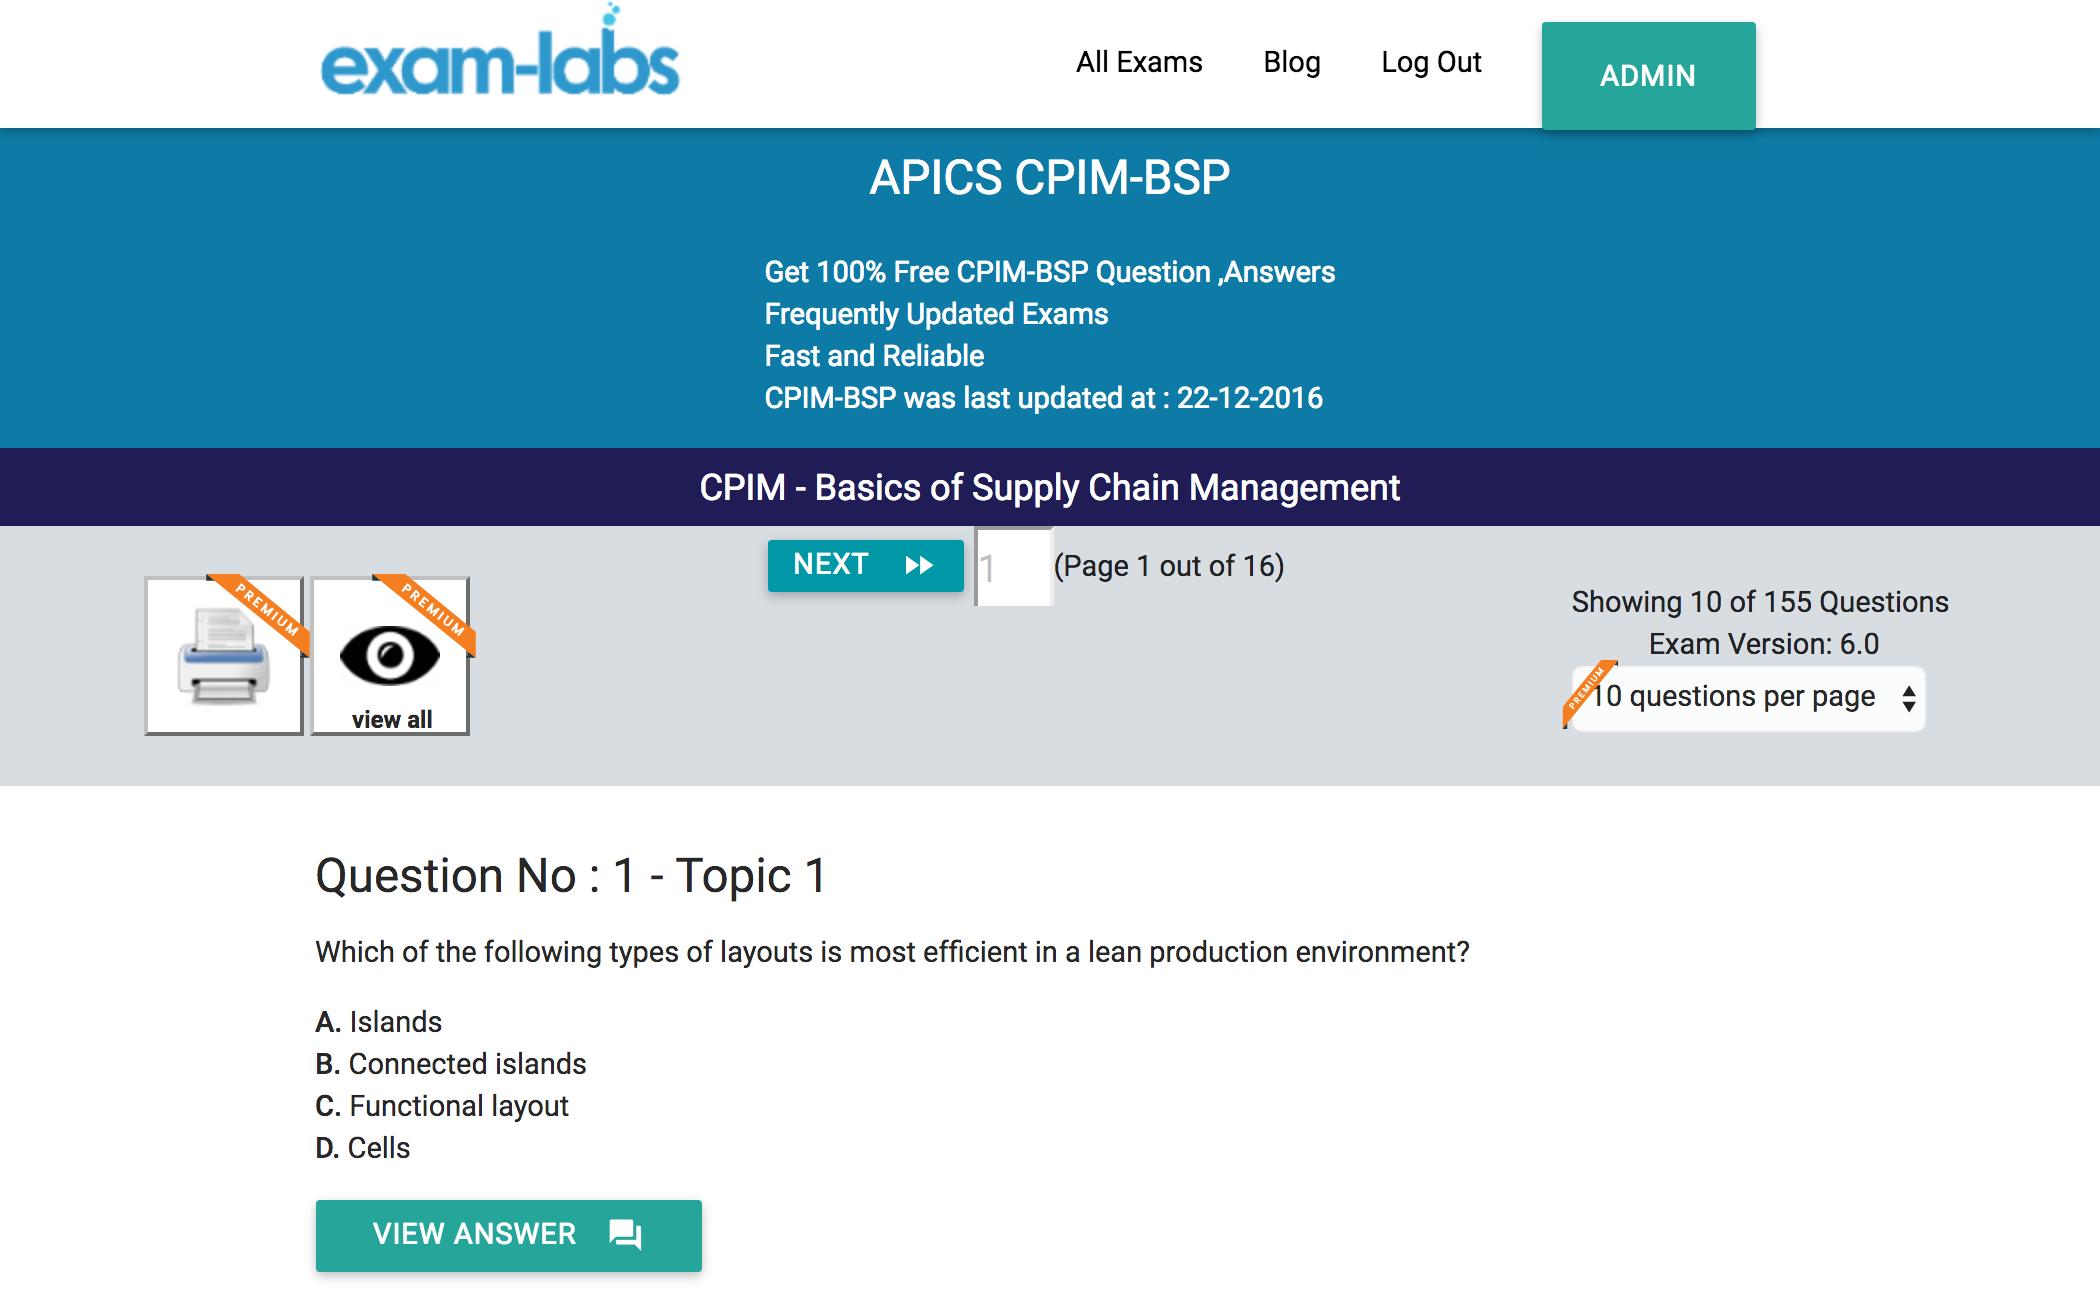 Cpim bsp apics practice exam questions 100 free exam labs cpim bsppracticeexam1 xflitez Gallery